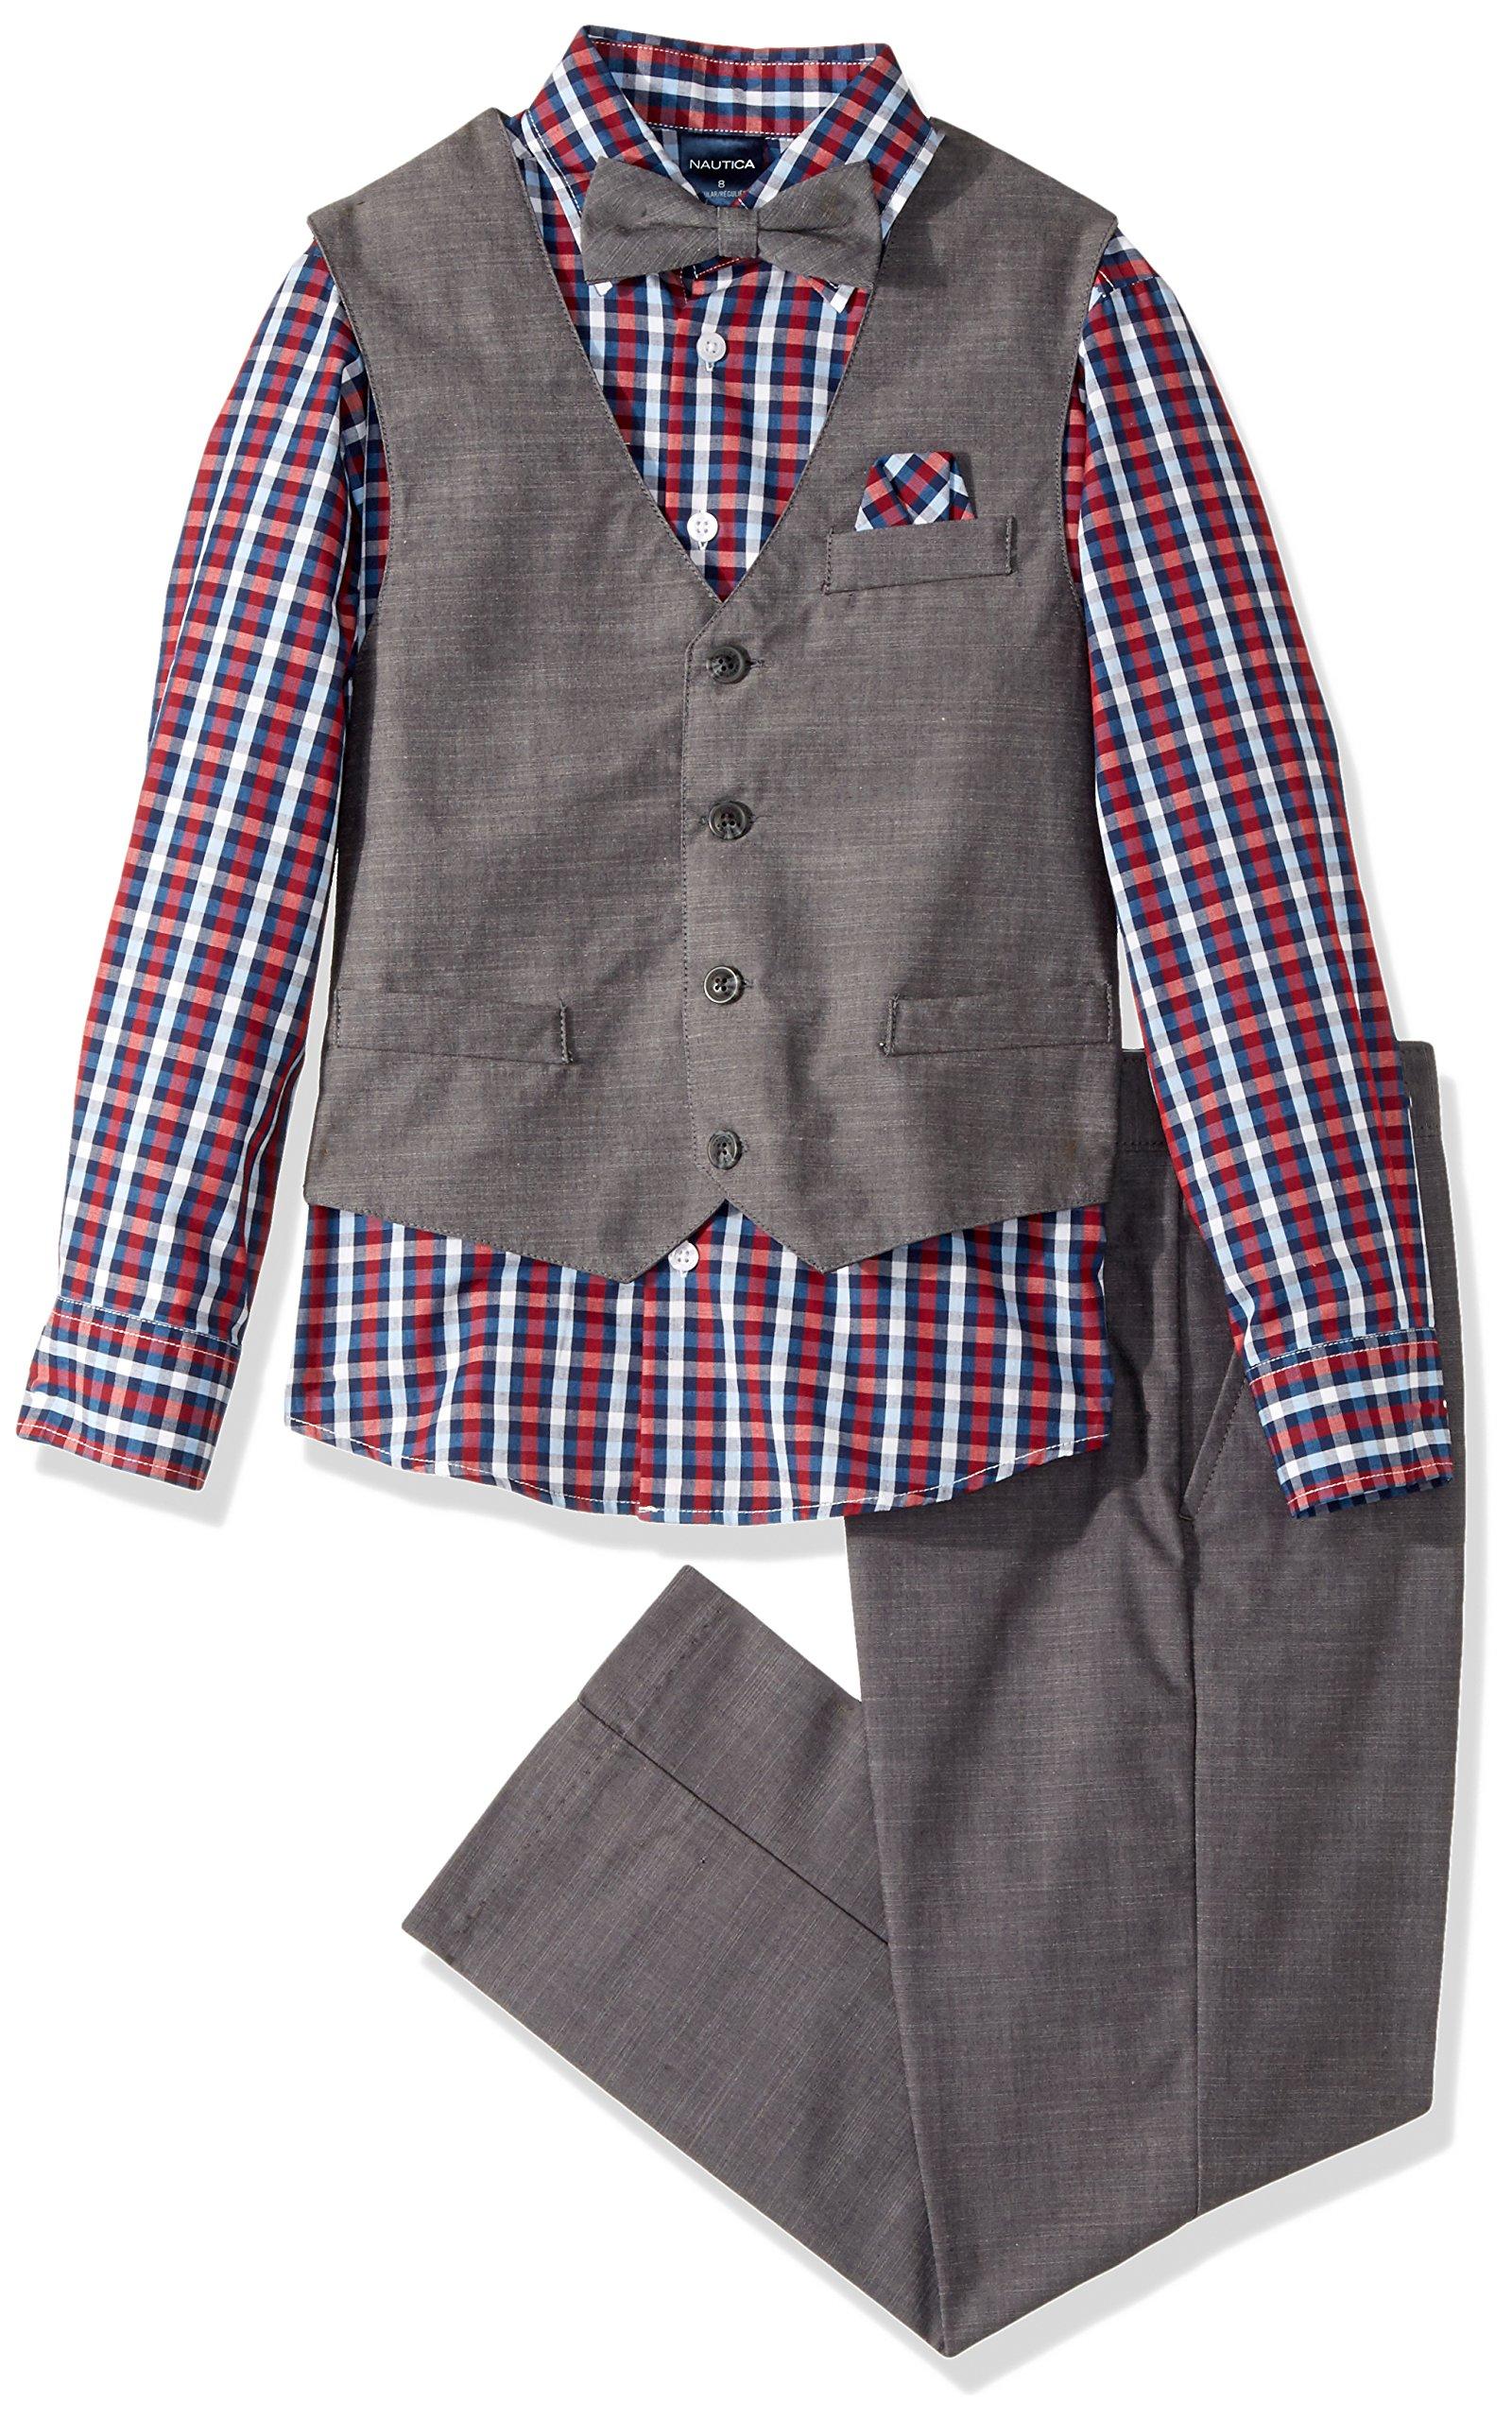 Nautica Boys' 4-Piece Vest Set with Dress Shirt, Bow Tie, Vest, and Pants, Dark Gray, 4T